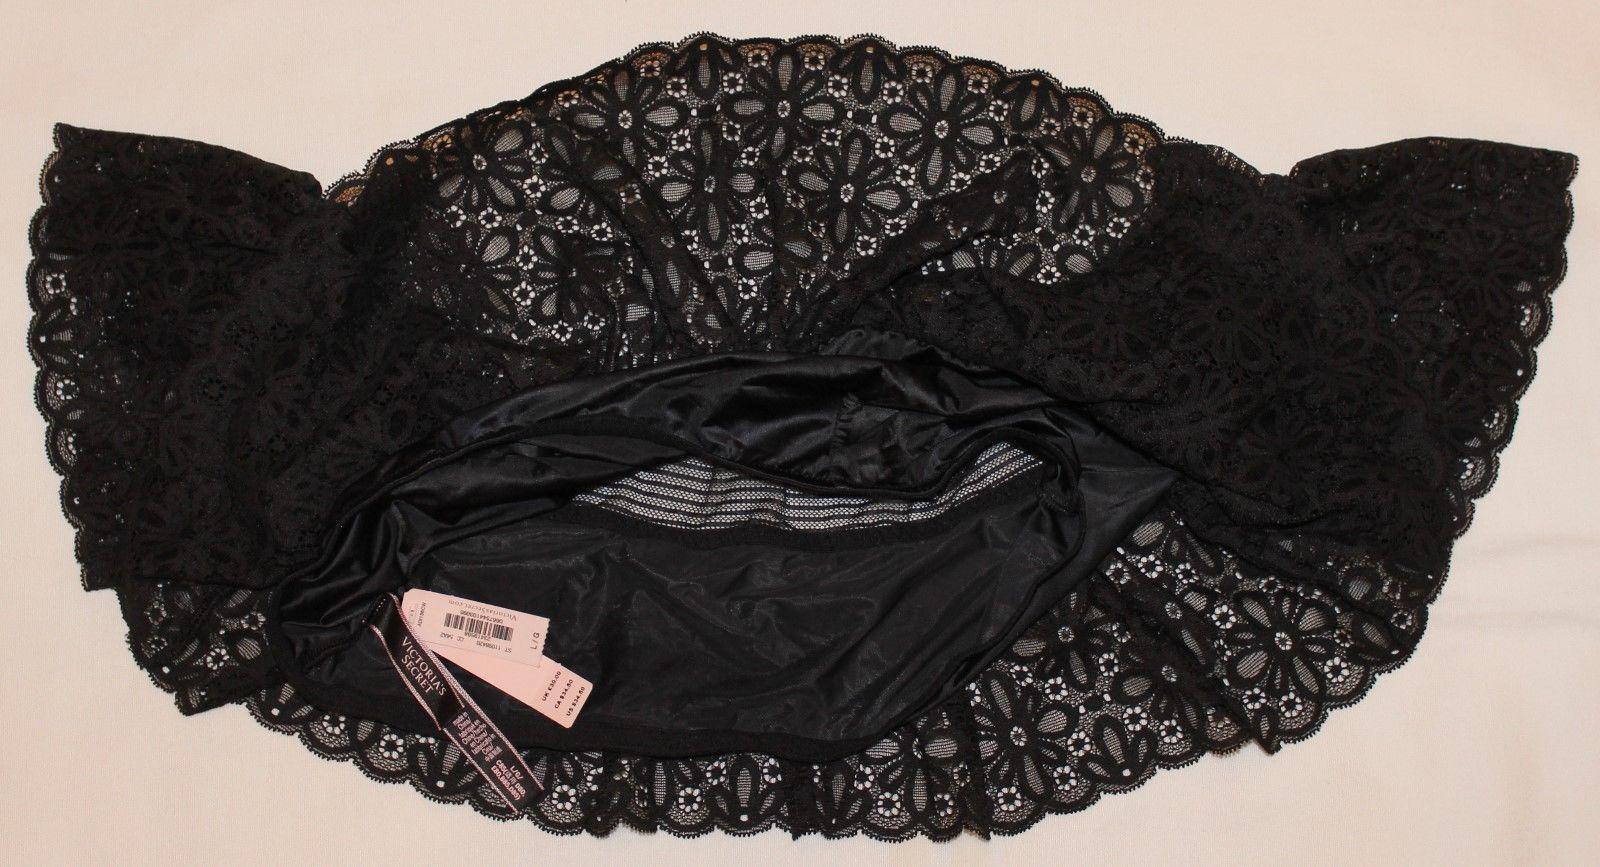 f0d8136c4a365 New $35 Victoria's Secret Black Lace Off and 50 similar items